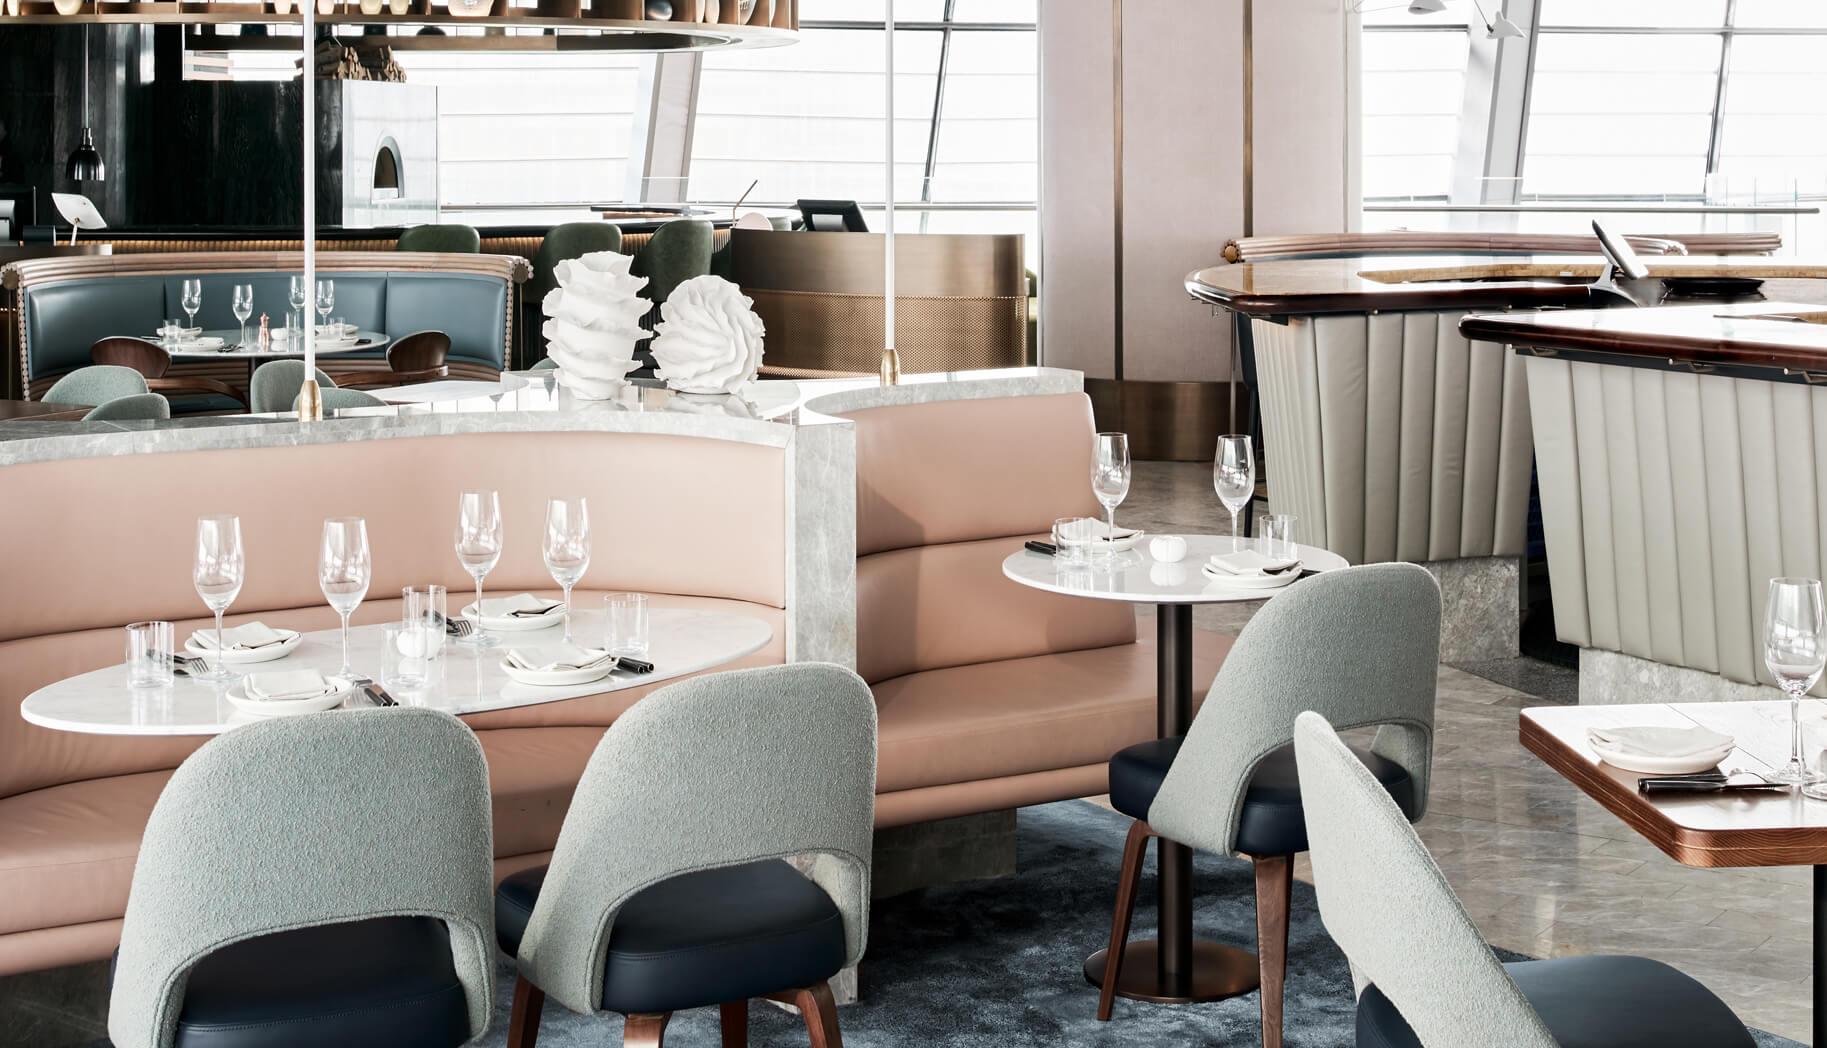 Restaurant Dining - The Loft at Dubai Opera